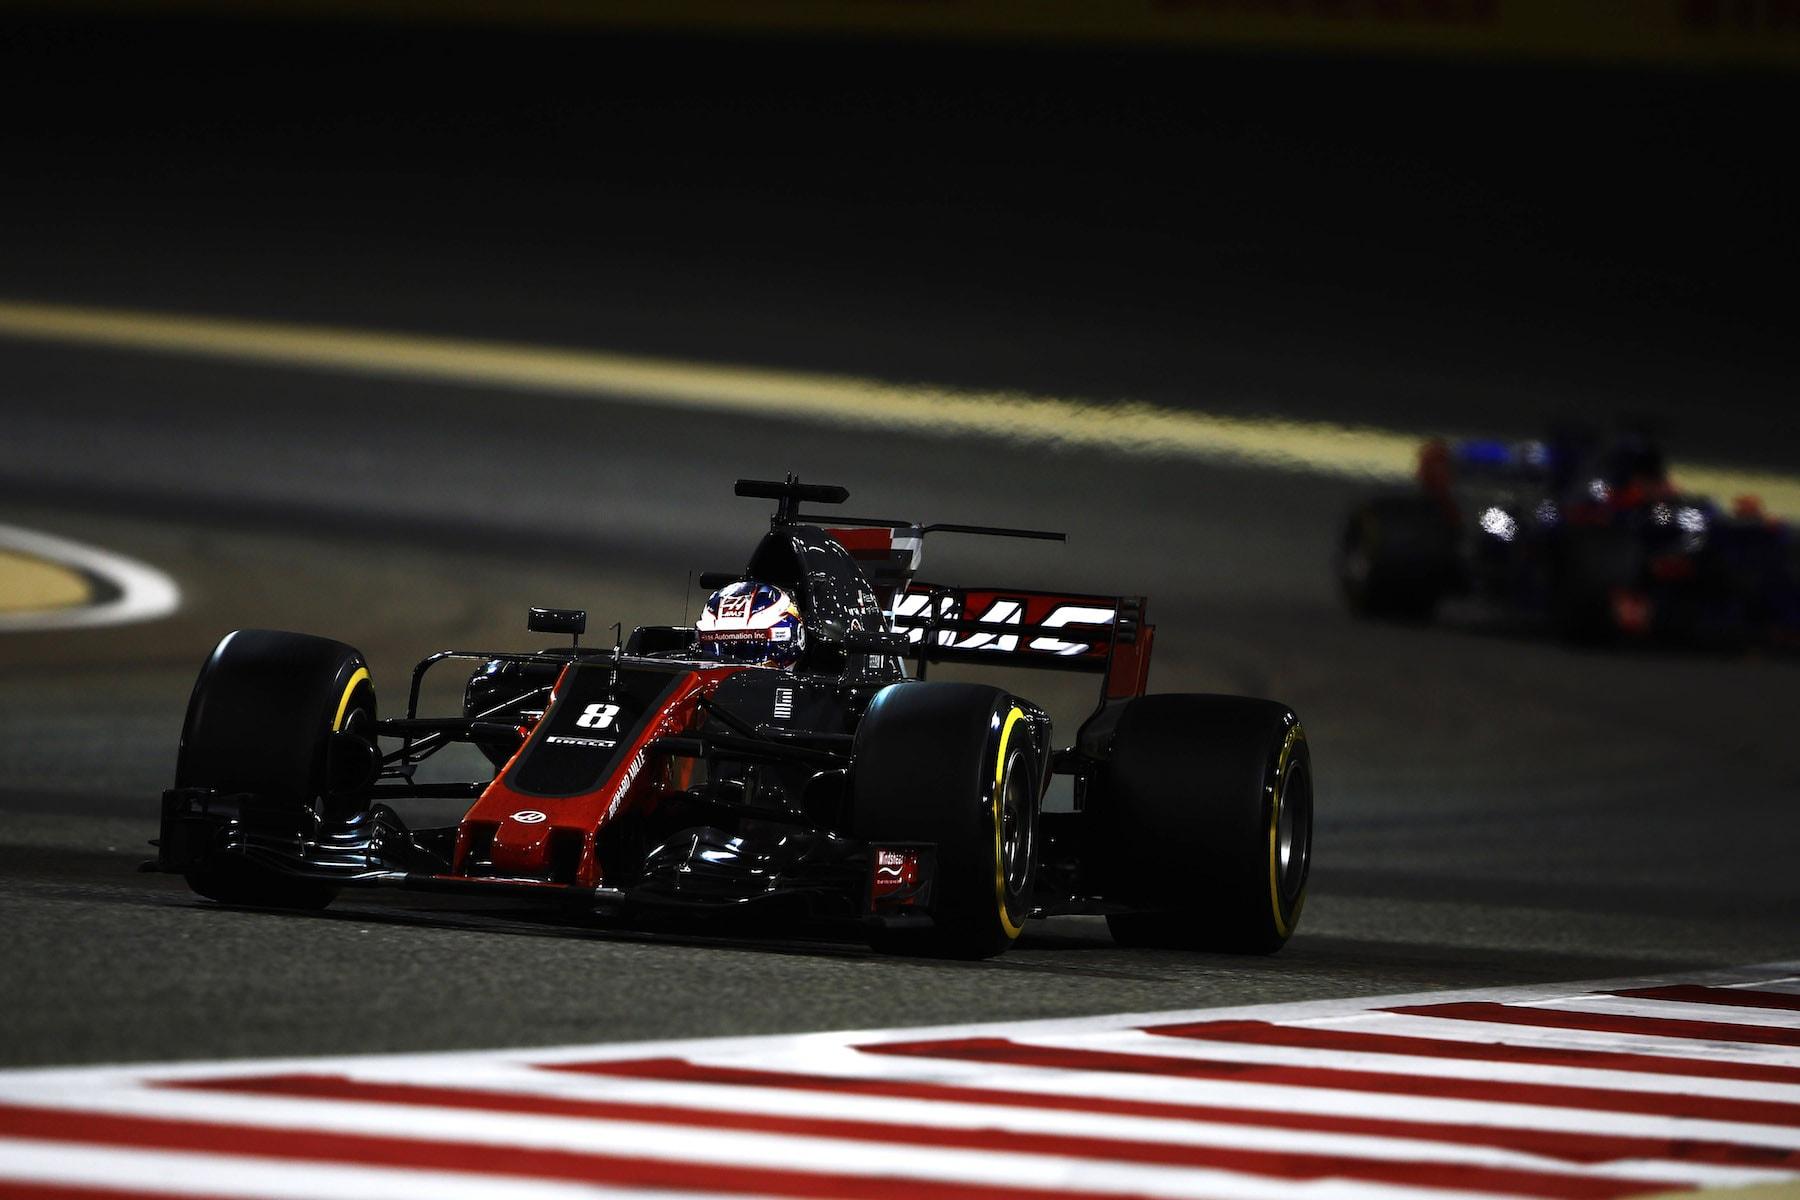 H 2017 Romain Grosjean   Haas VF17   2017 Bahrain GP P8 2 copy.jpg